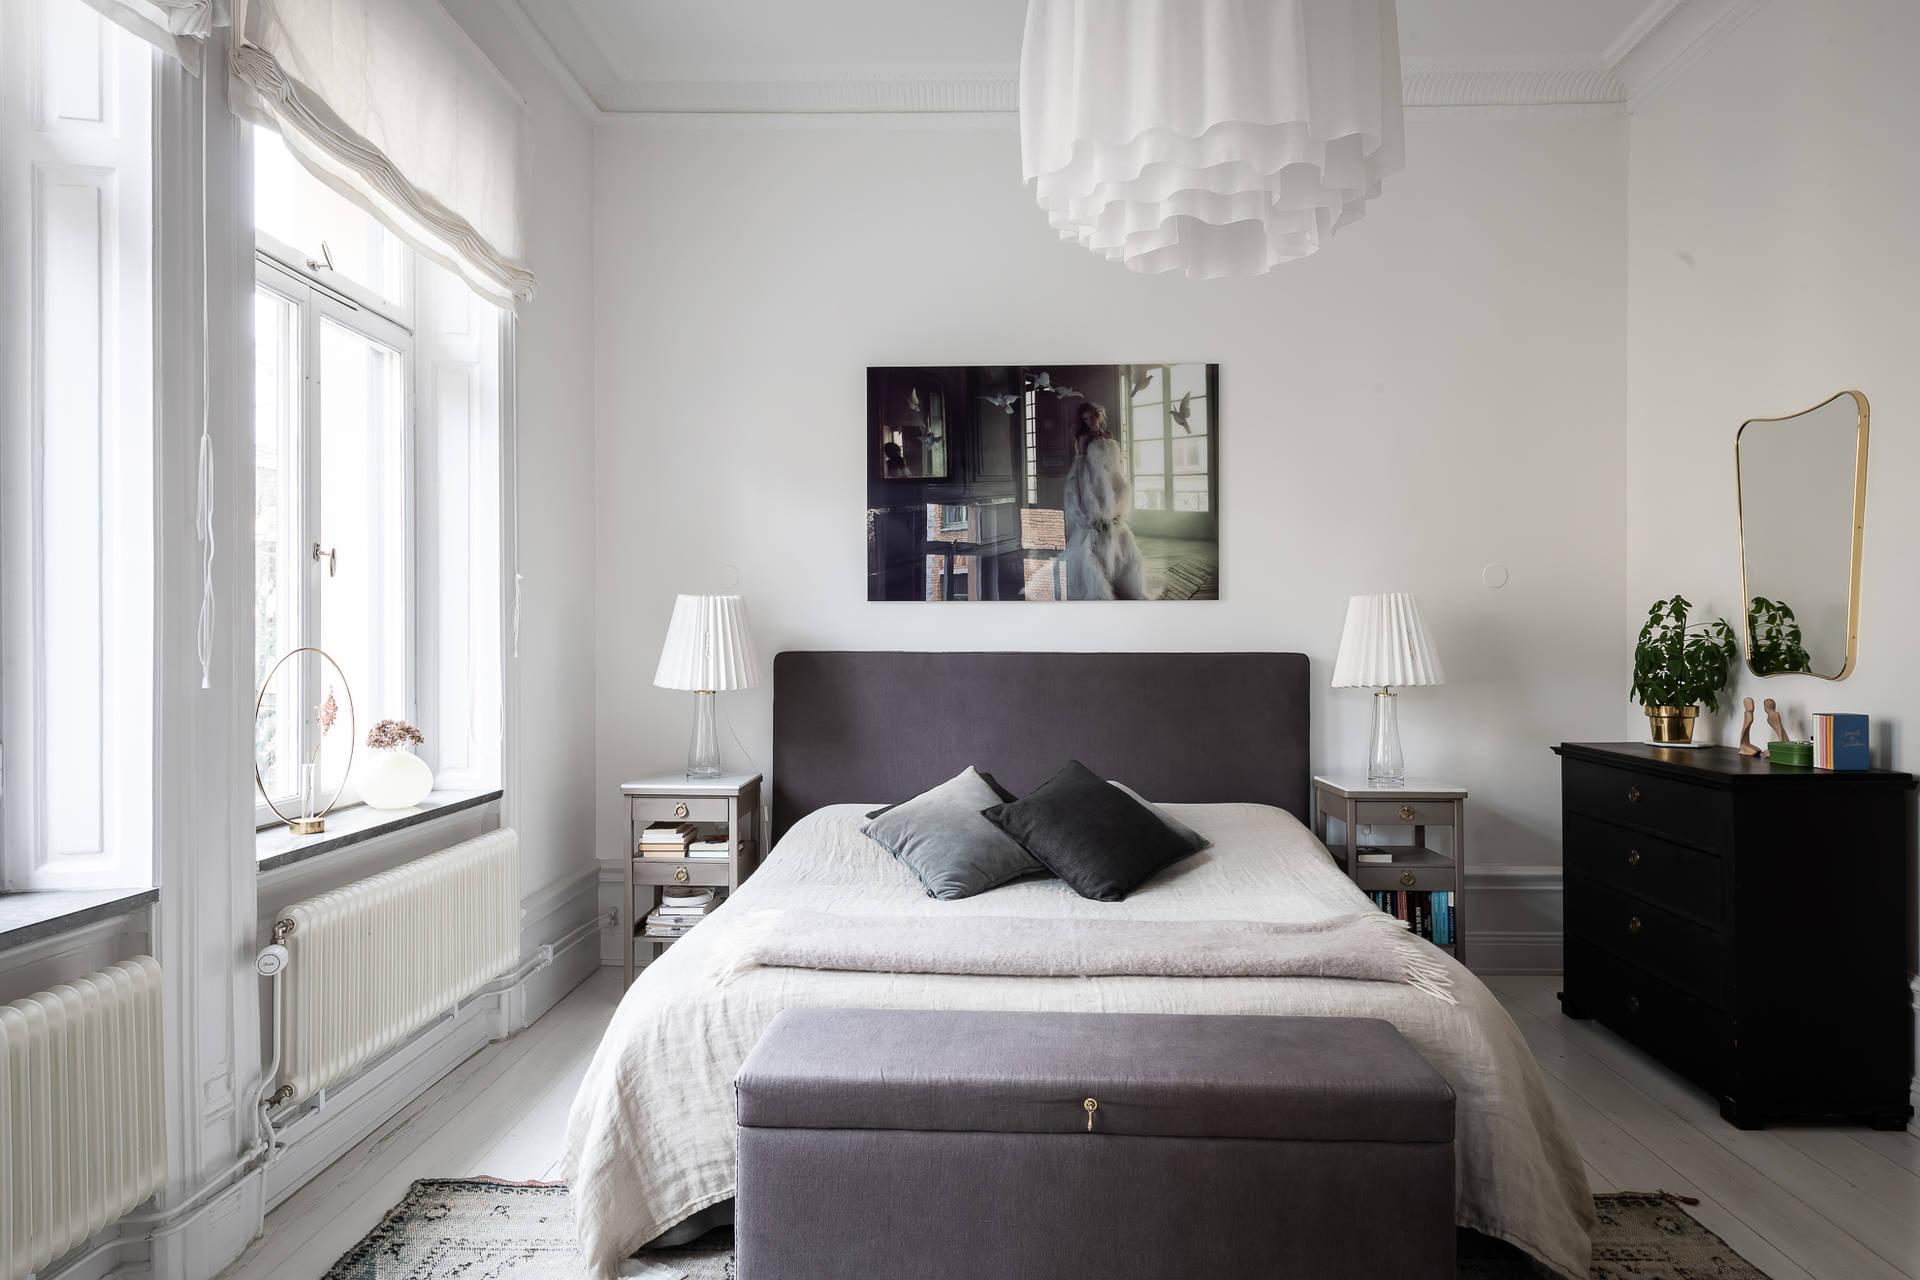 1 My Luxury Linen peace of home.jpg